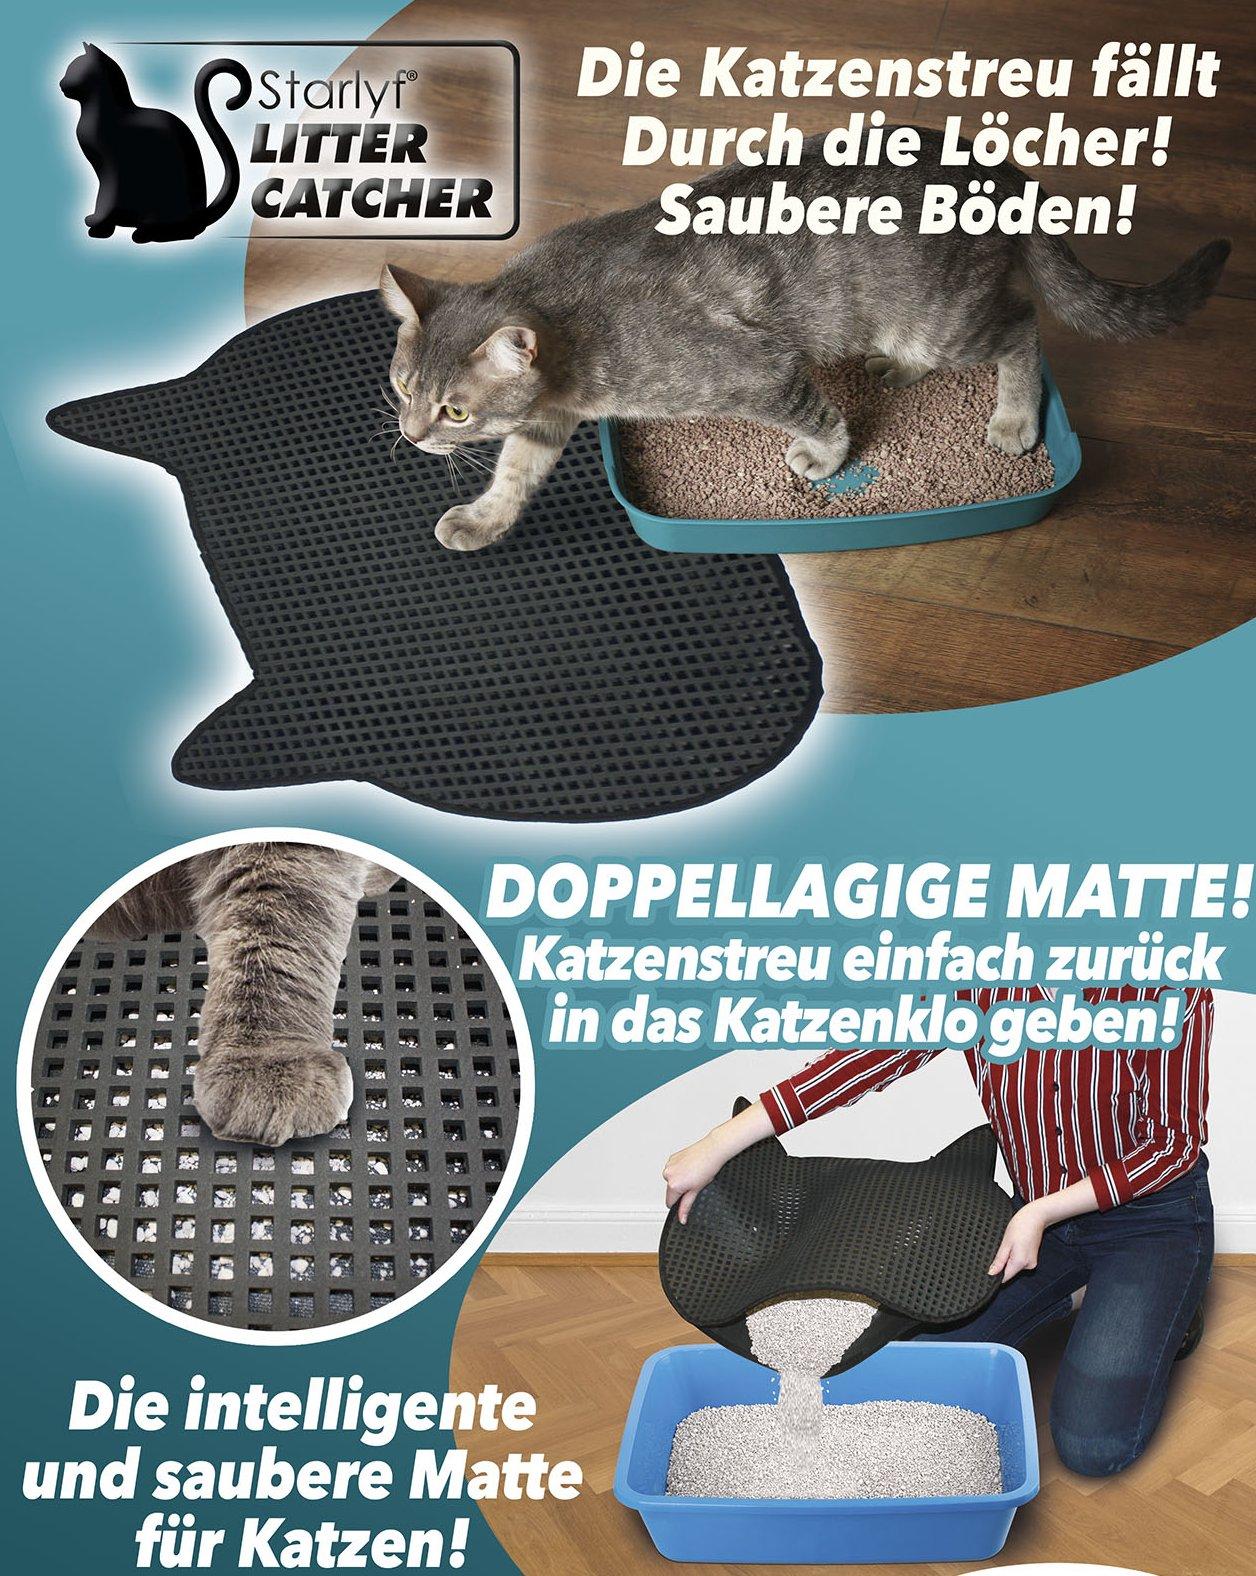 Katzenmatte - so bleibt's sauber!